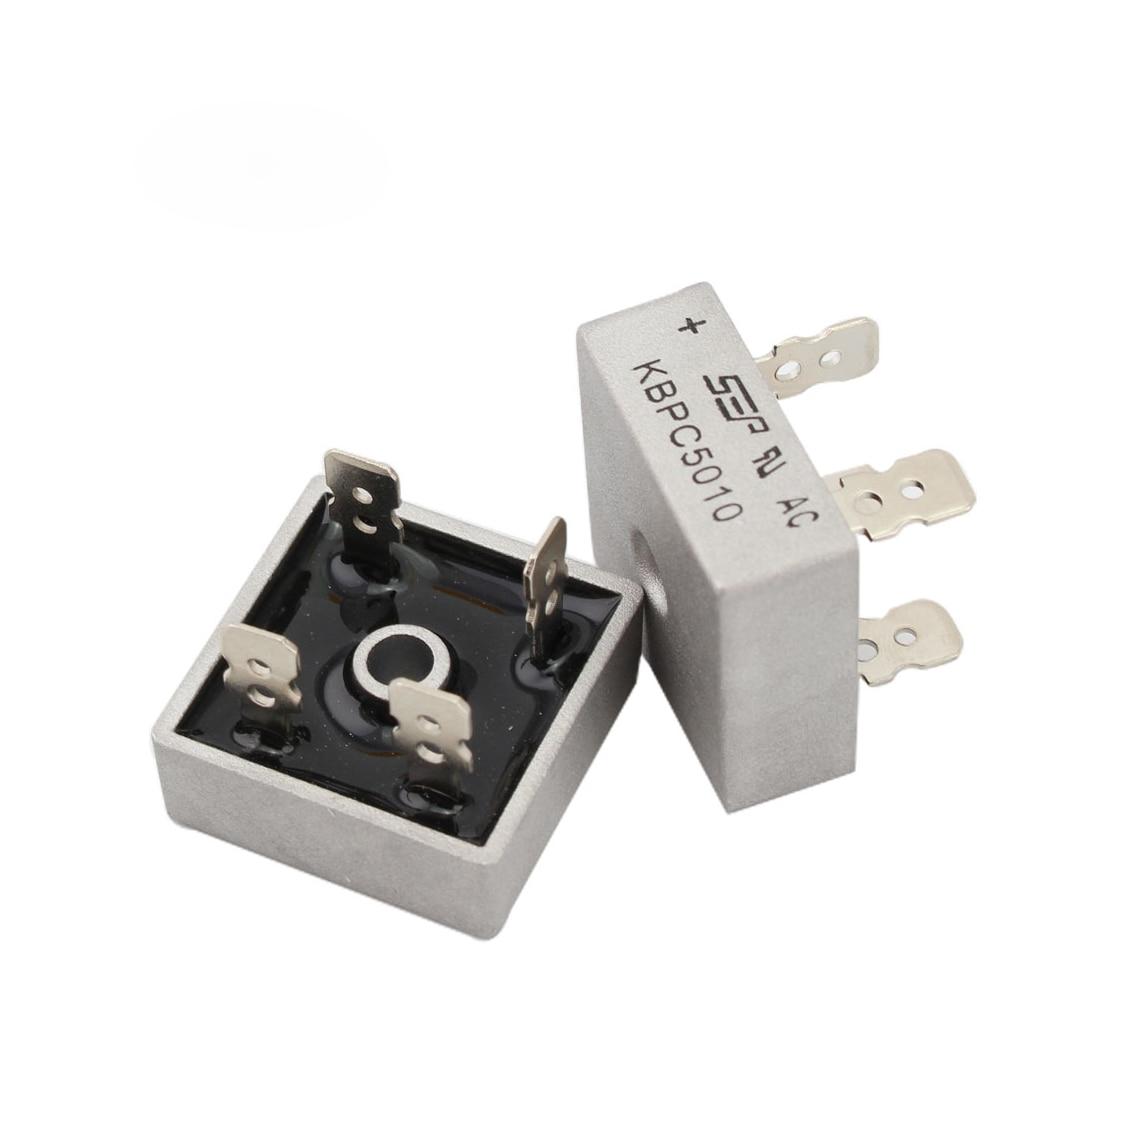 5pcs/lot KBPC5010 Diode Bridge Rectifier Diode 50A 1000V KBPC 5010 Power Rectifier Diode Electronica Componentes